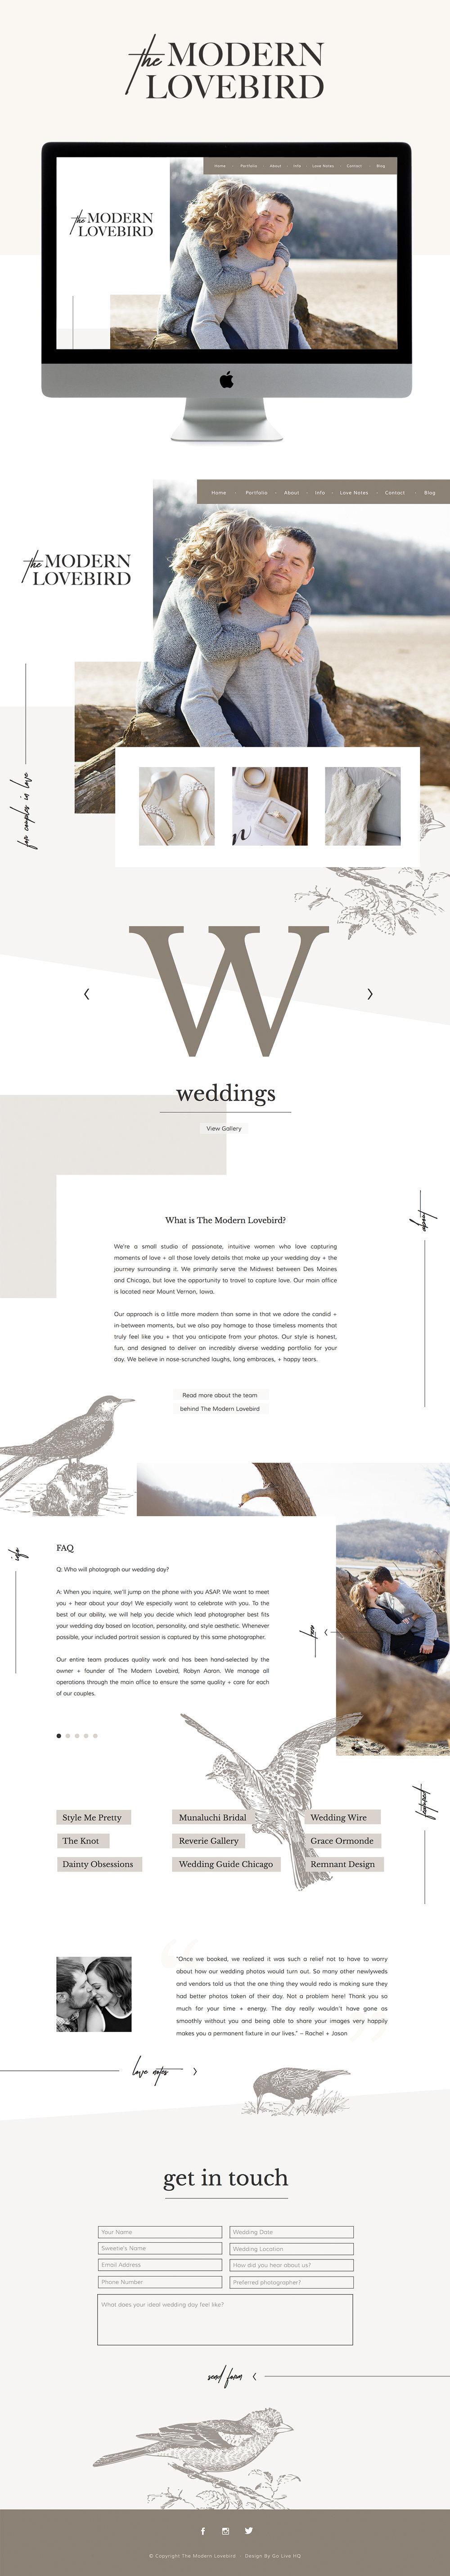 Free,+adventurous+&+intimate+showit+website+design+_+designed+by_+golivehq.jpg